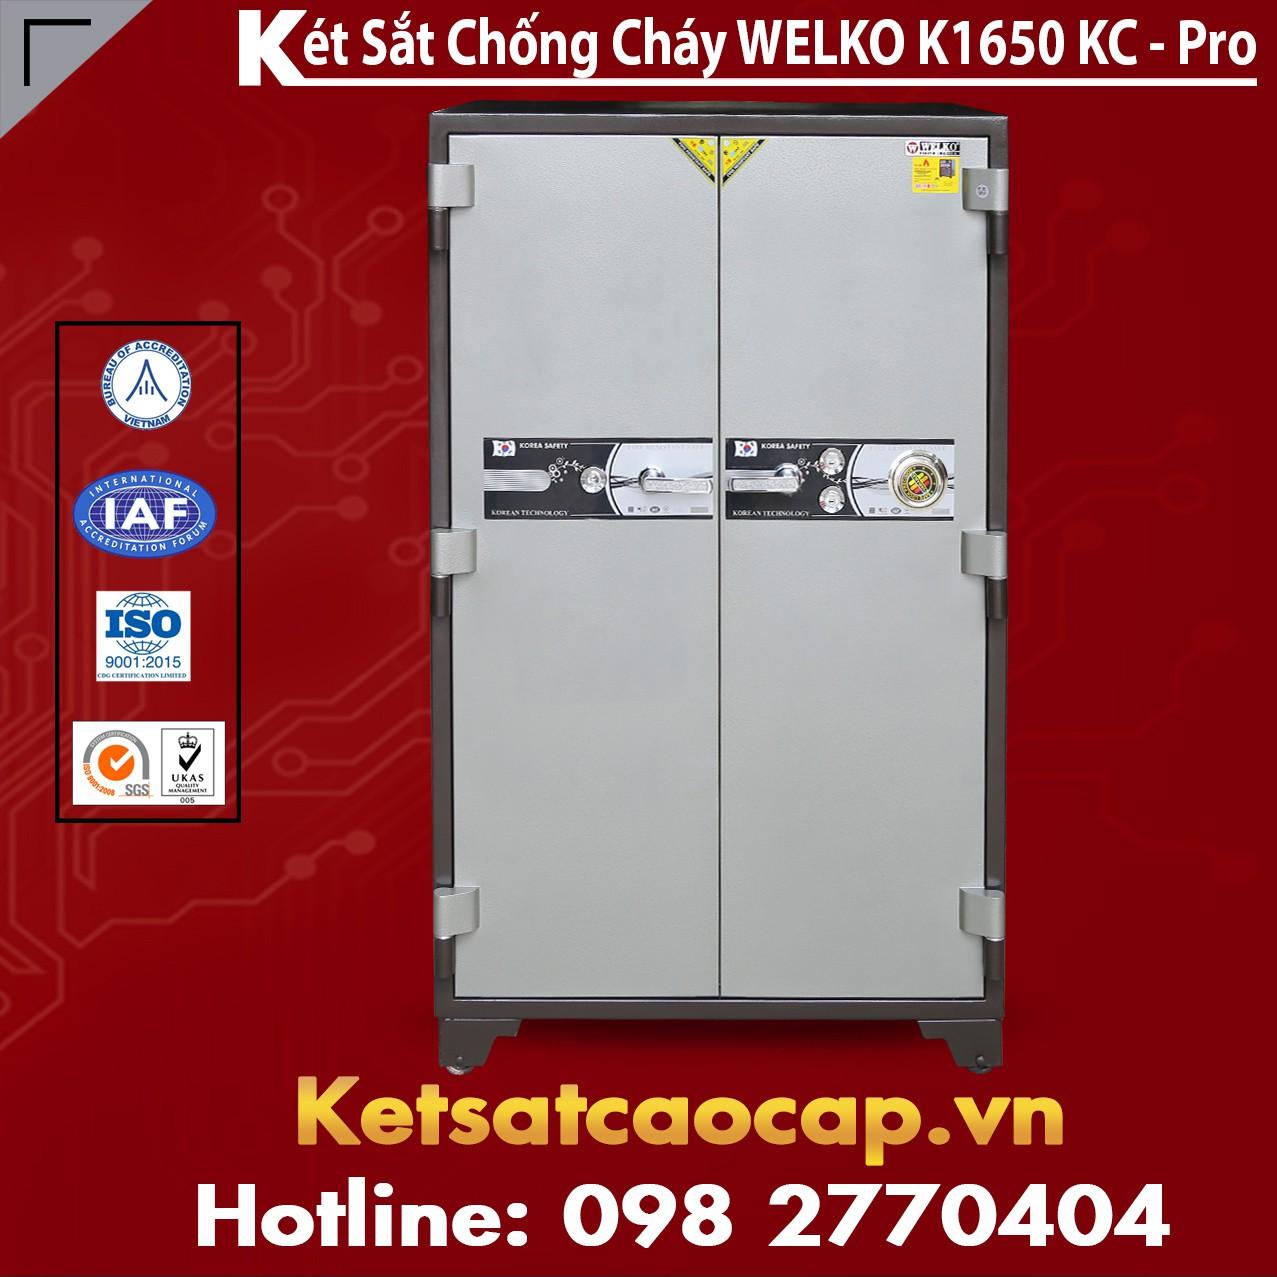 Két Sắt Chống Cháy Welko K1650 KC - Pro